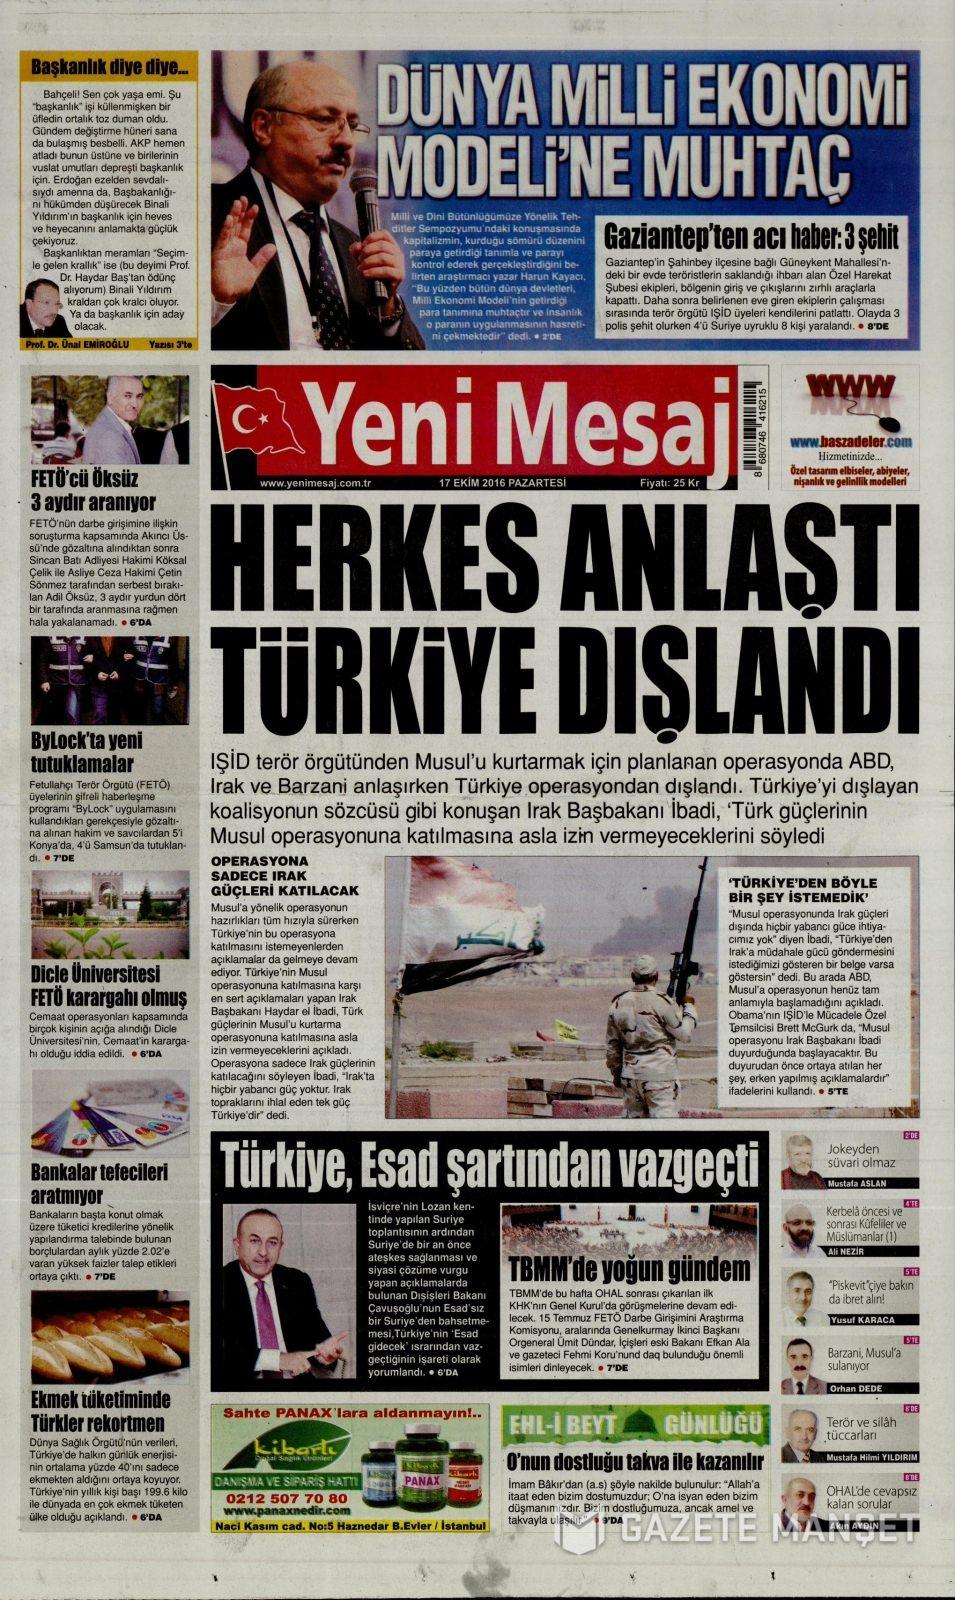 17 Ekim Pazartesi gazete manşetleri 25